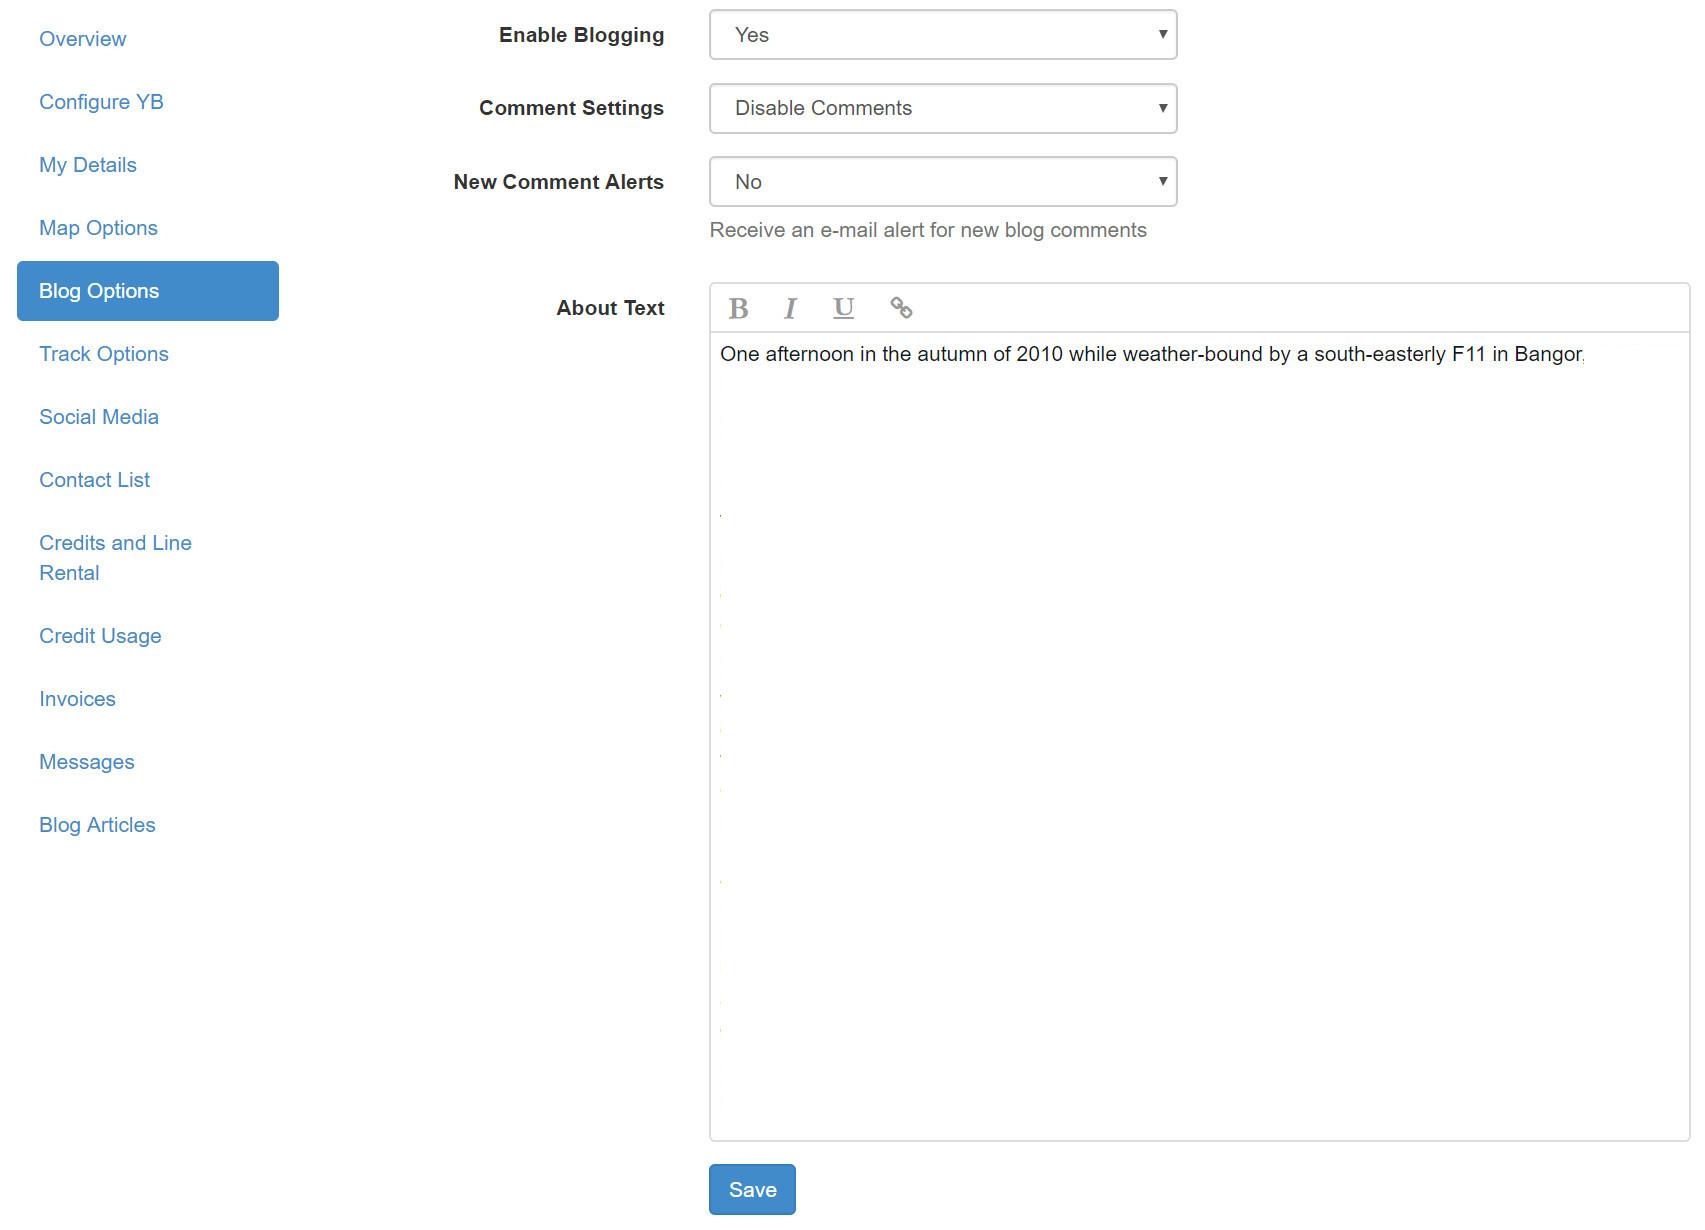 YBlog - Blog Options